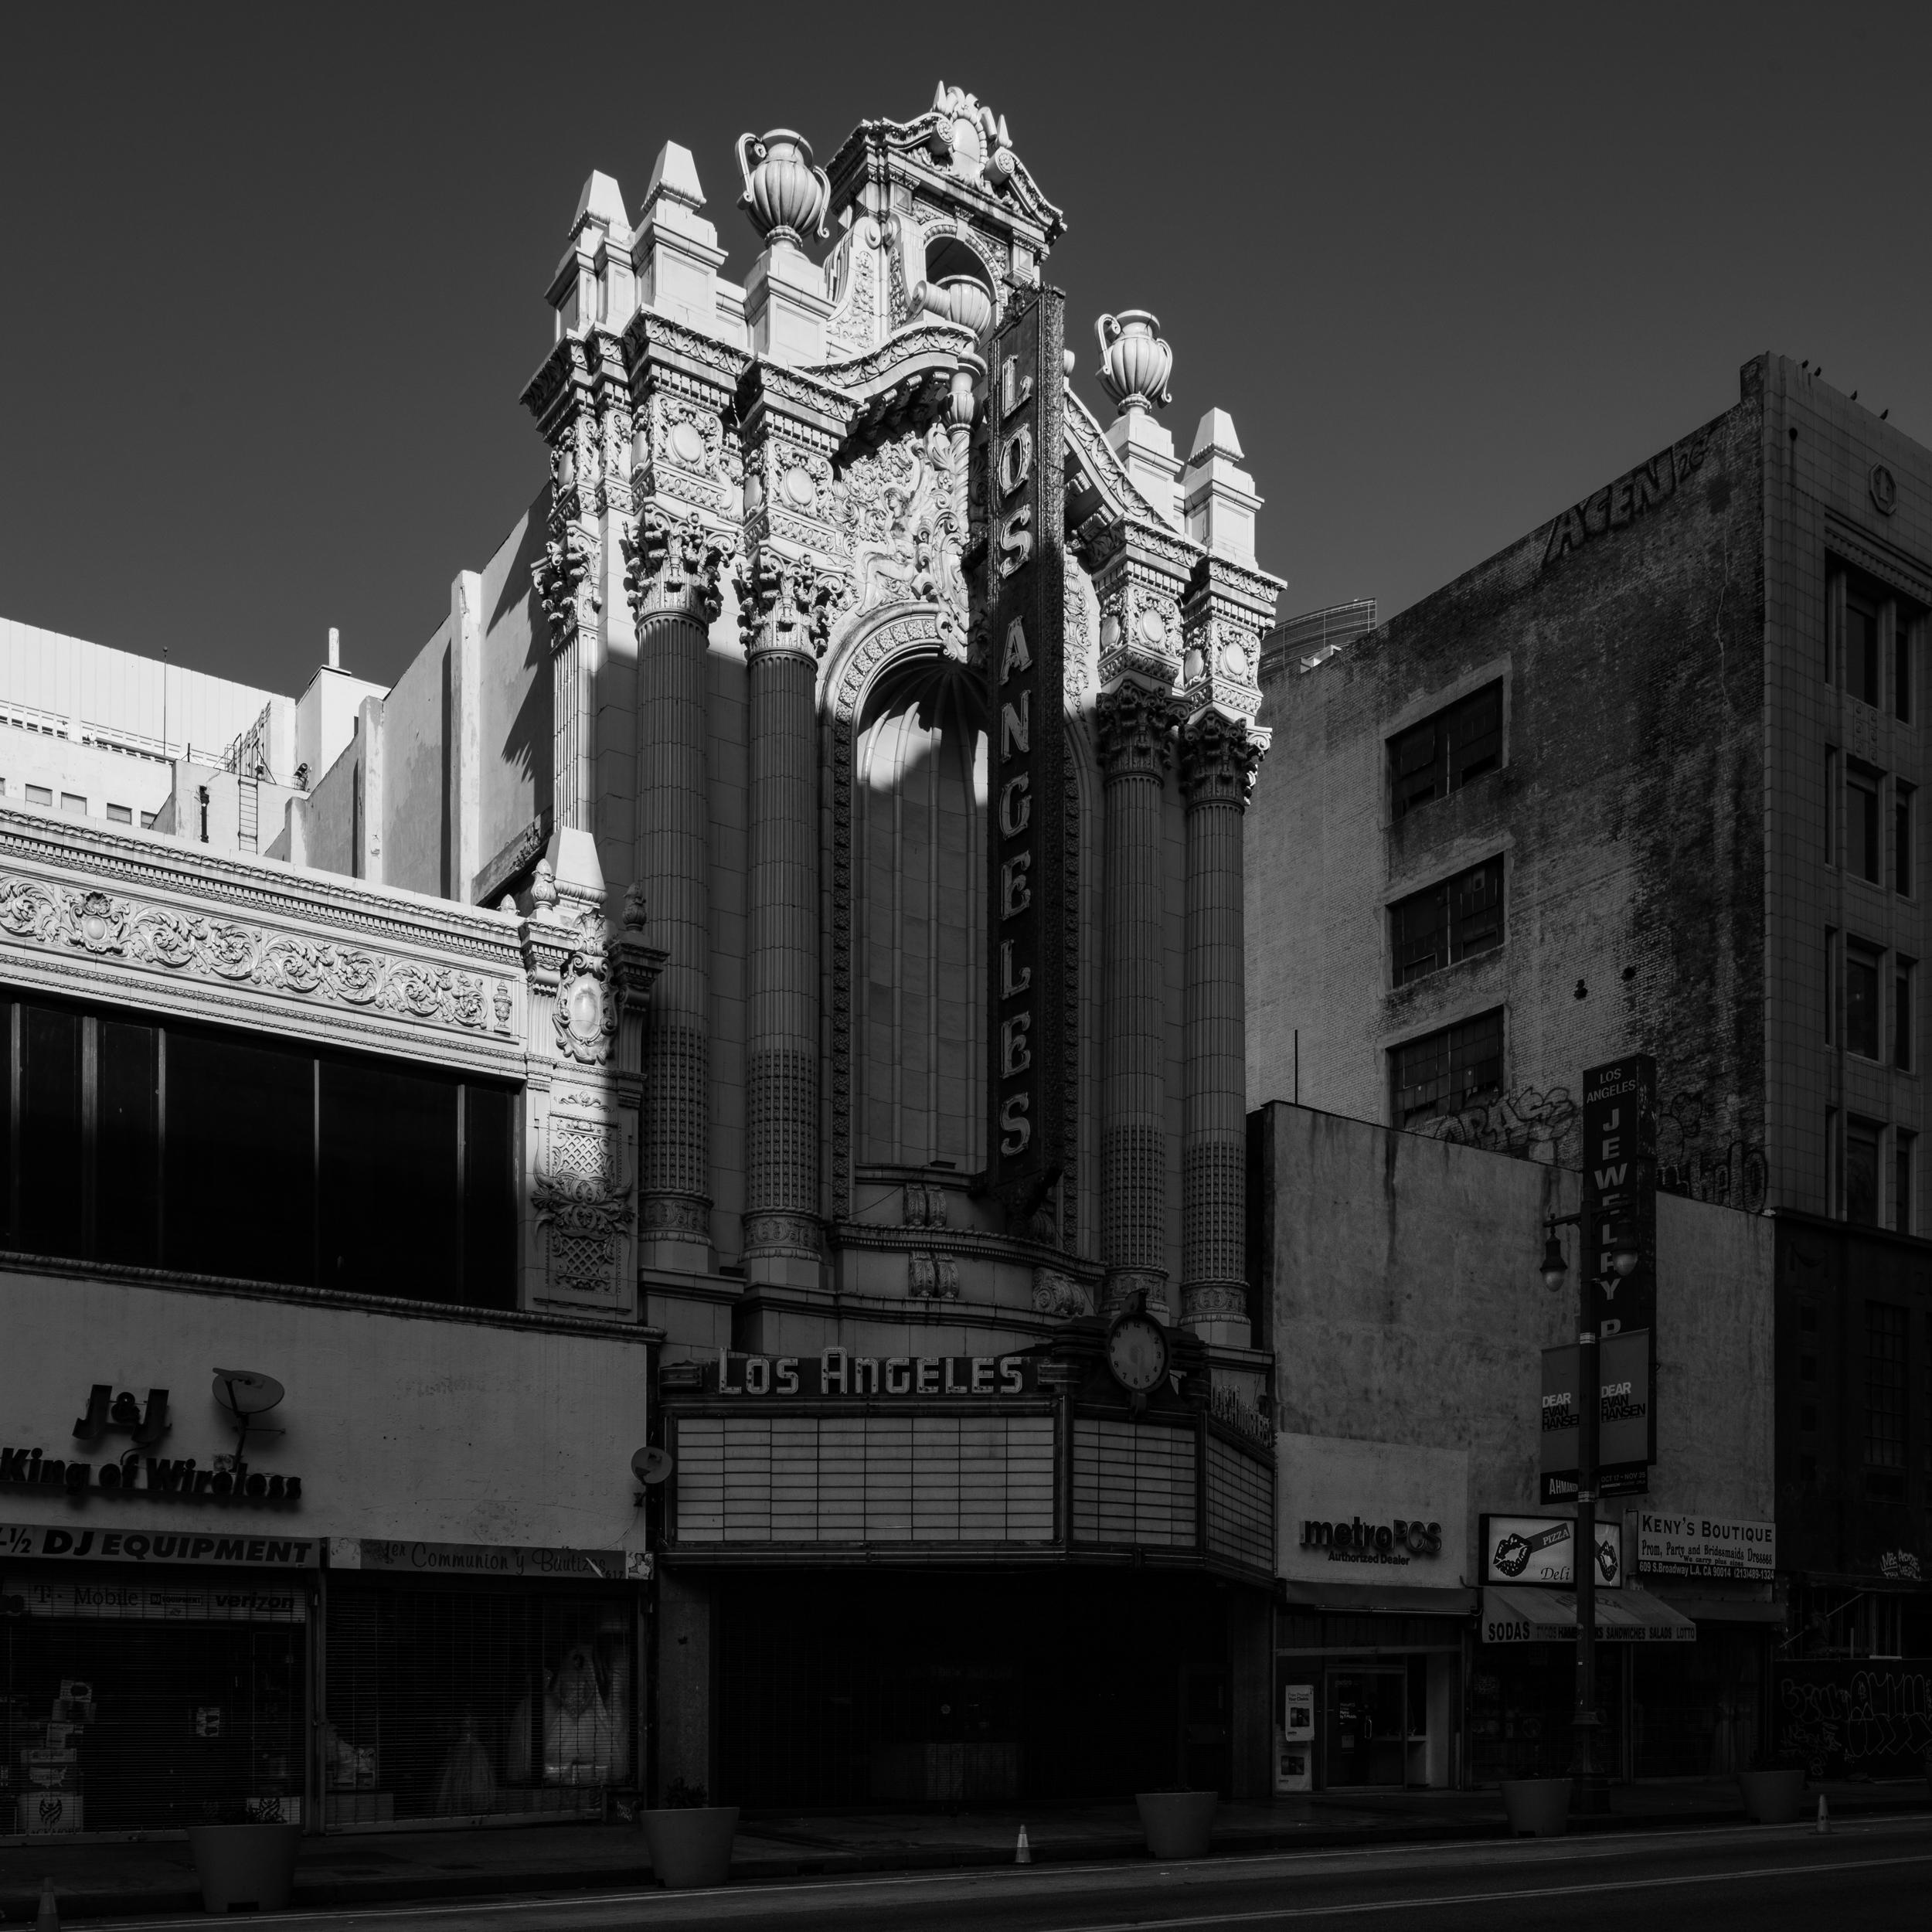 LOS ANGELES THEATRE__MORNING_001.jpg